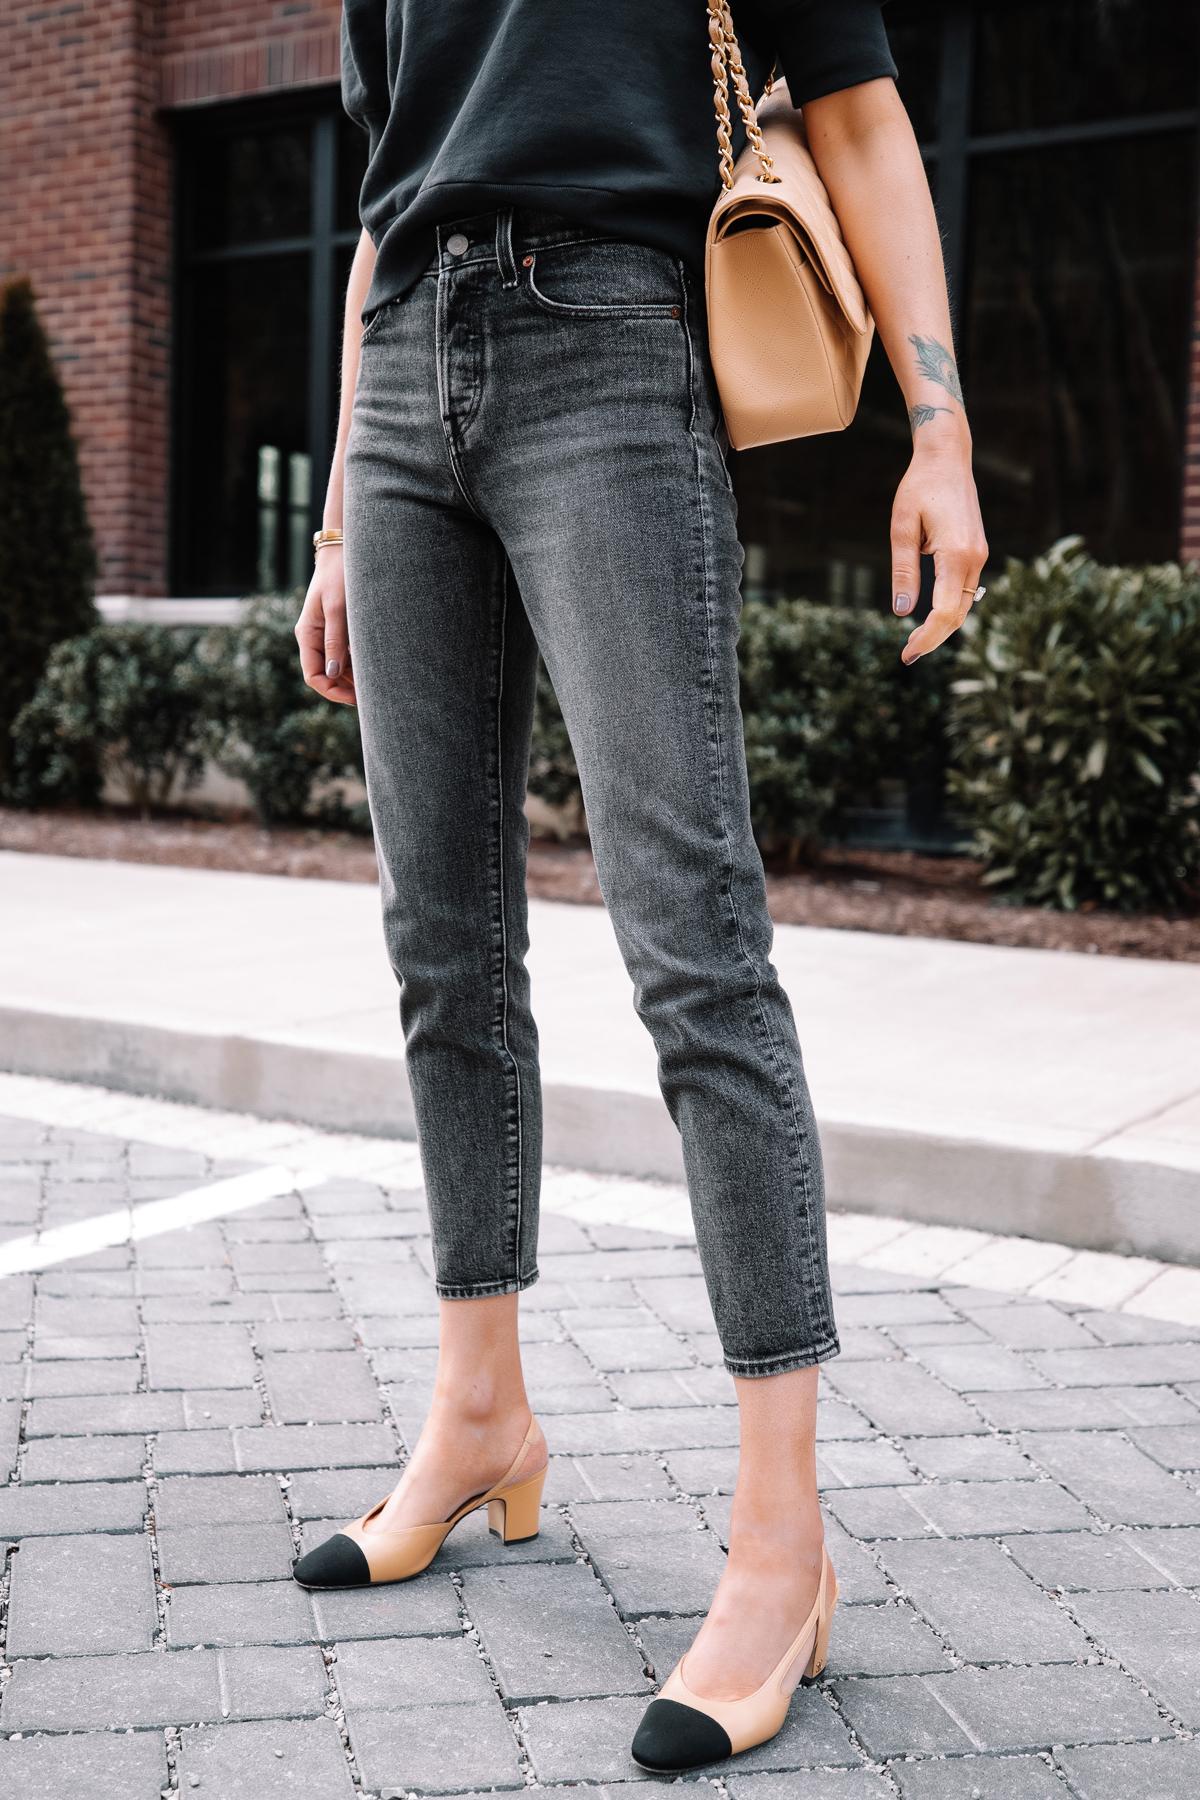 Fashion Jackson Wearing Navy Short Sleeve Sweatshirt Levis Wedgie Black Jeans Chanel Slingbacks 1